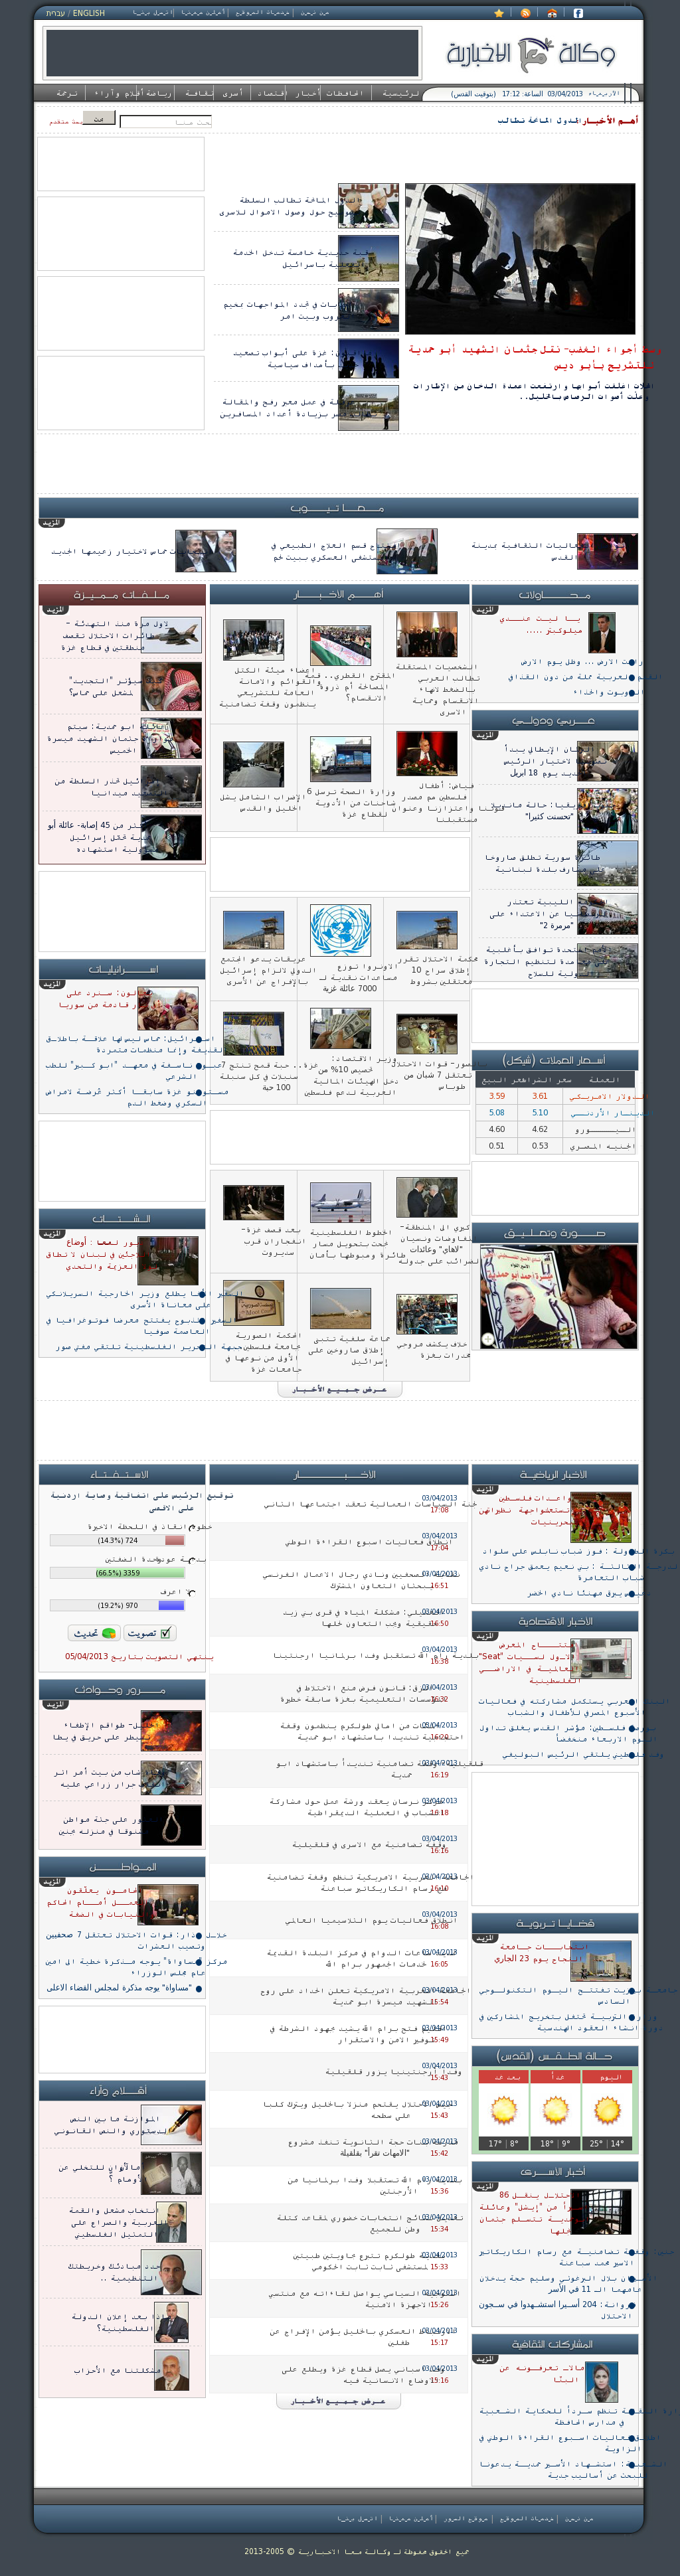 Ma'an News at Wednesday April 3, 2013, 2:12 p.m. UTC